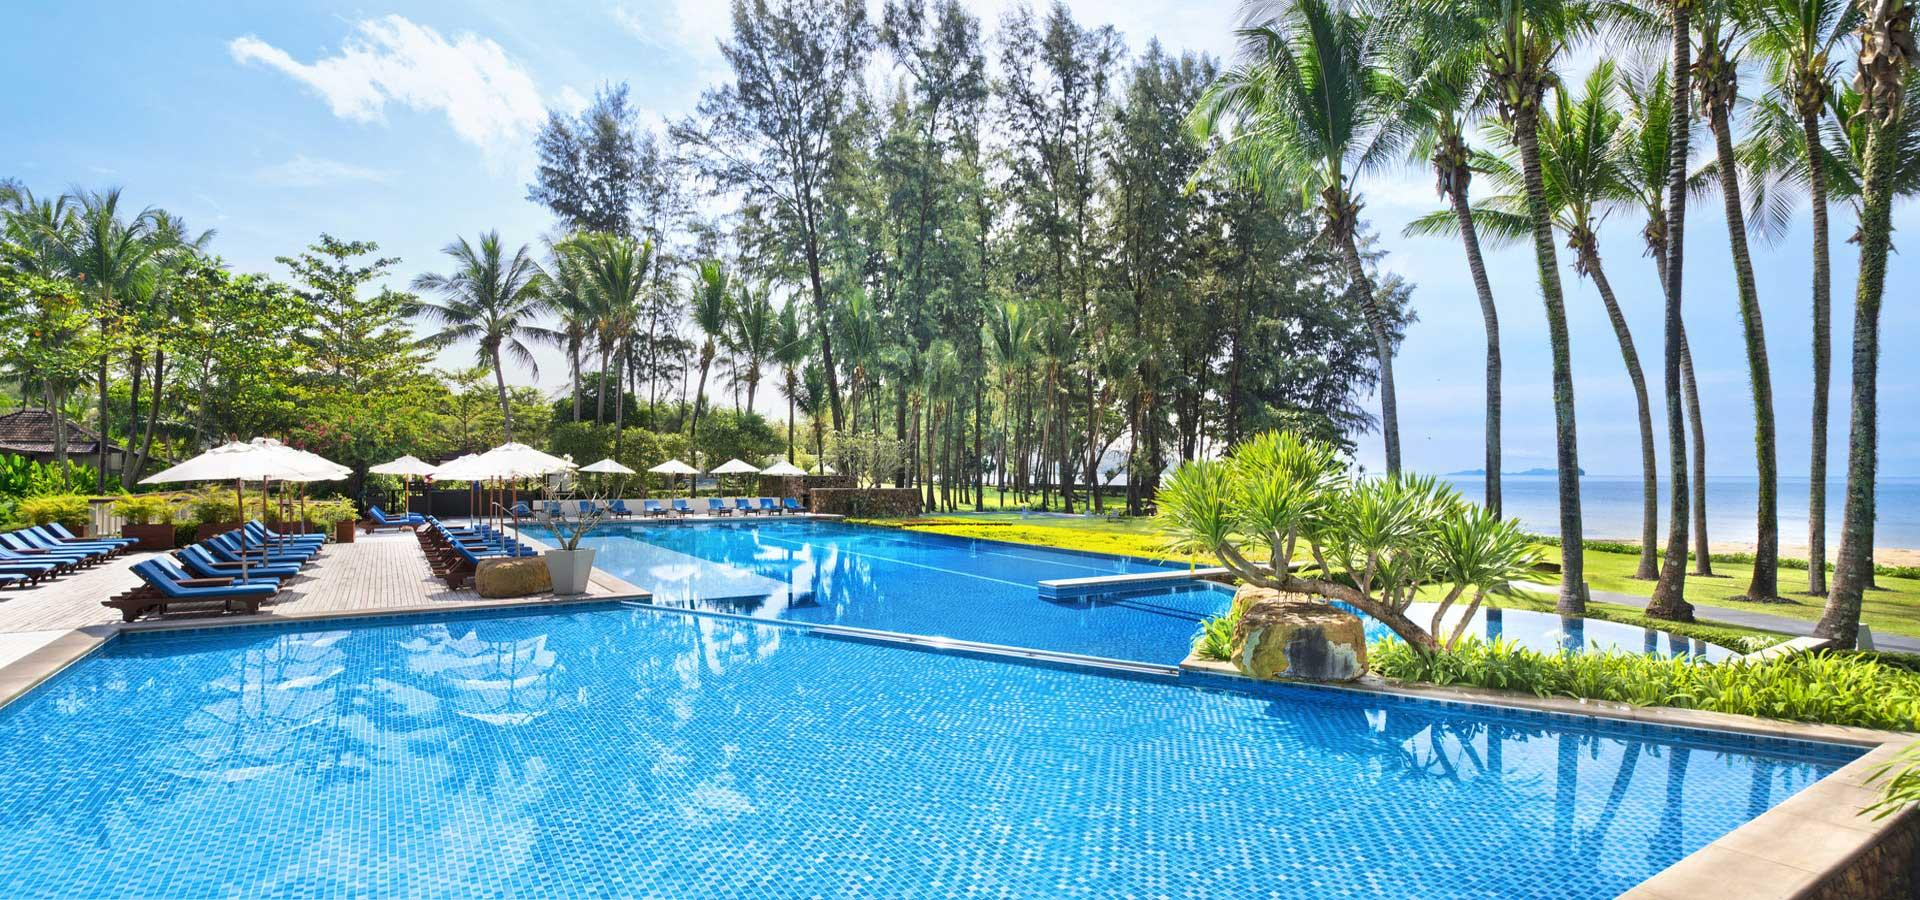 Holidays at Dusit Thani Krabi Beach Resort in Krabi, Thailand